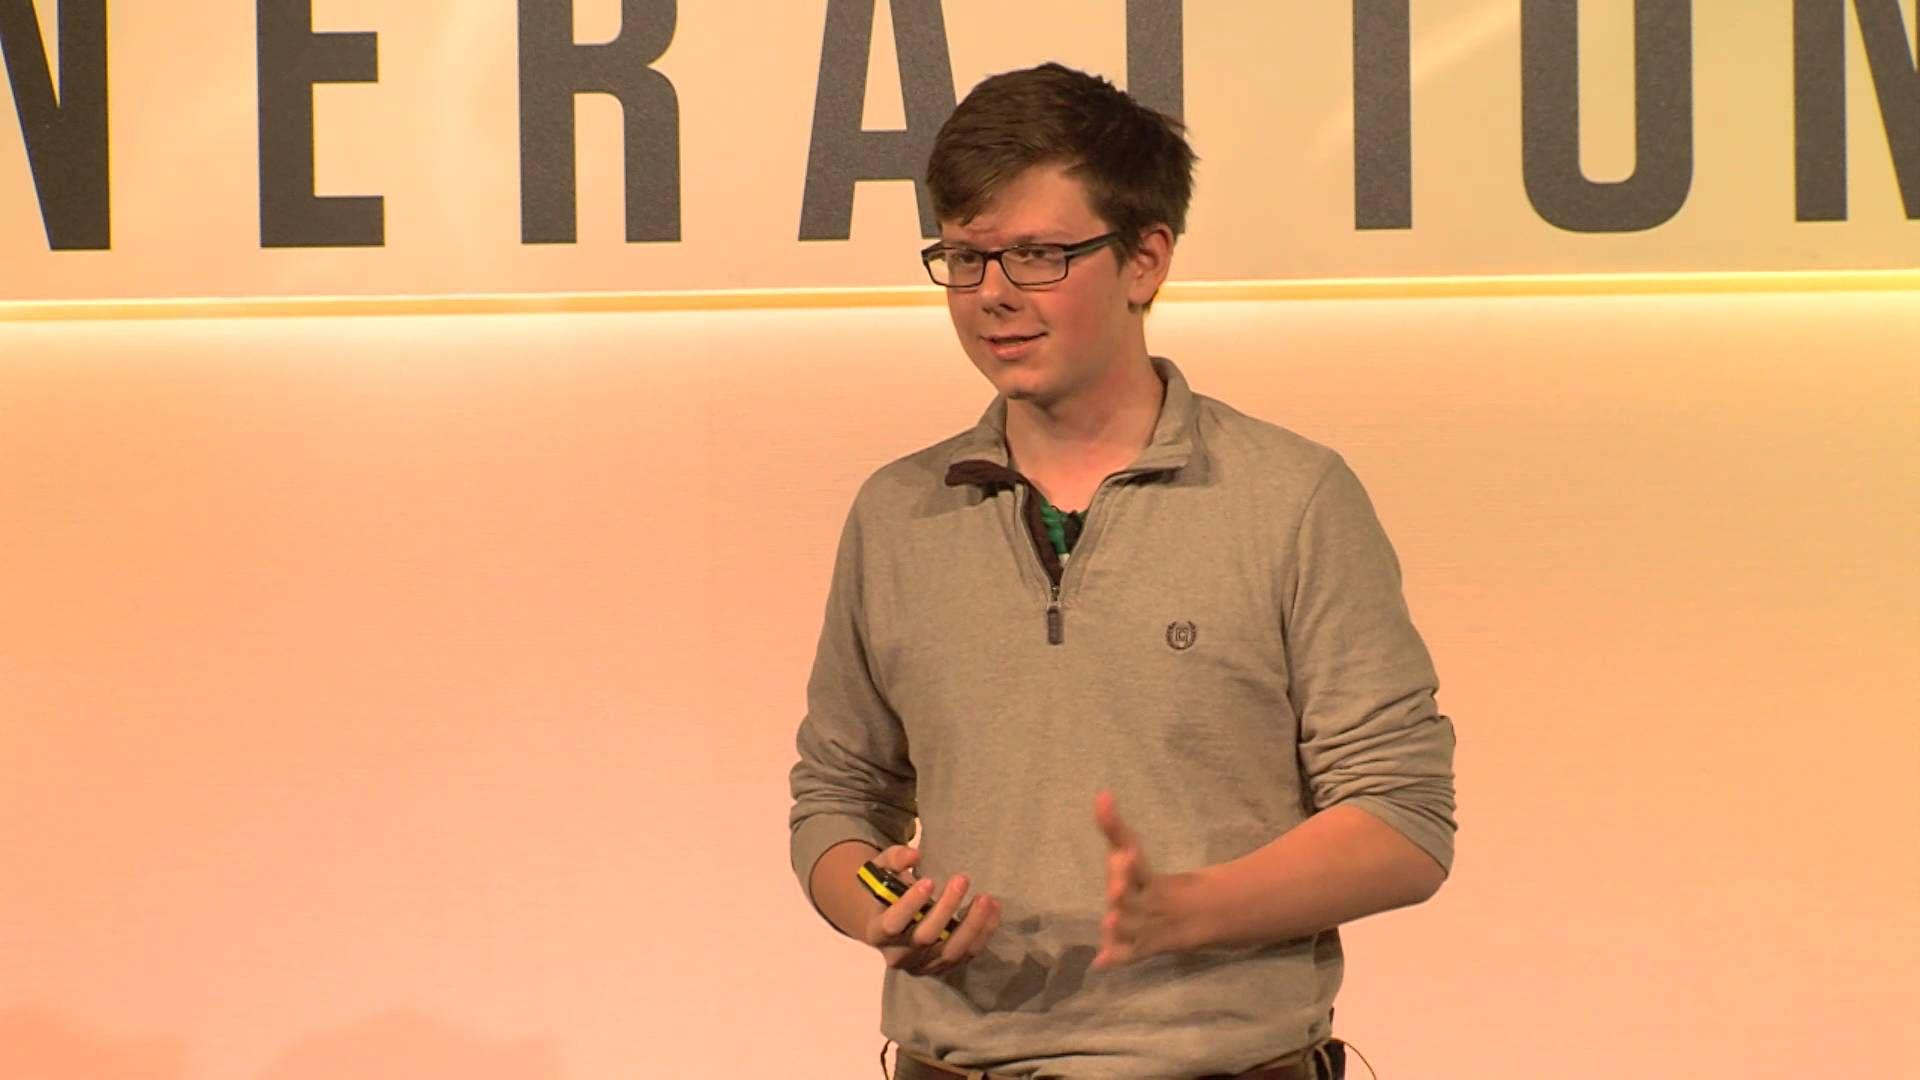 milionar adolescent erik bitcoin